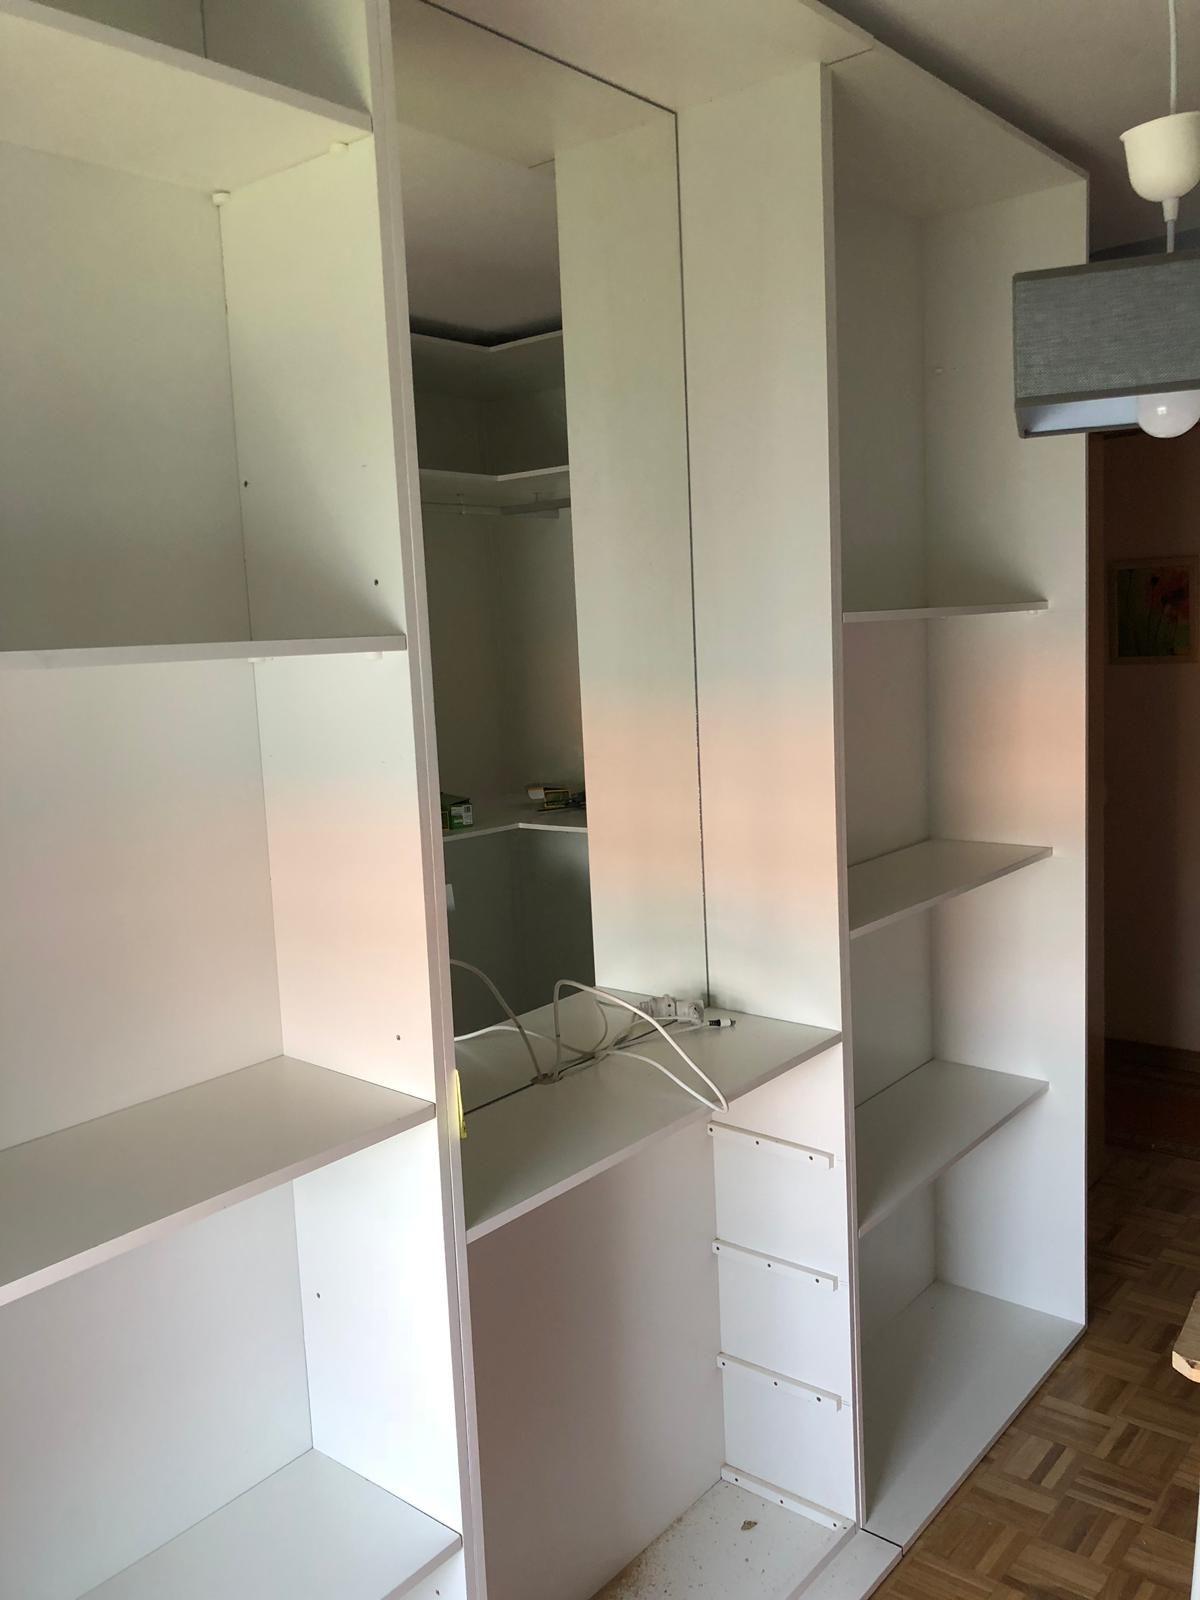 Interiores de armarios a medida en A Coruña